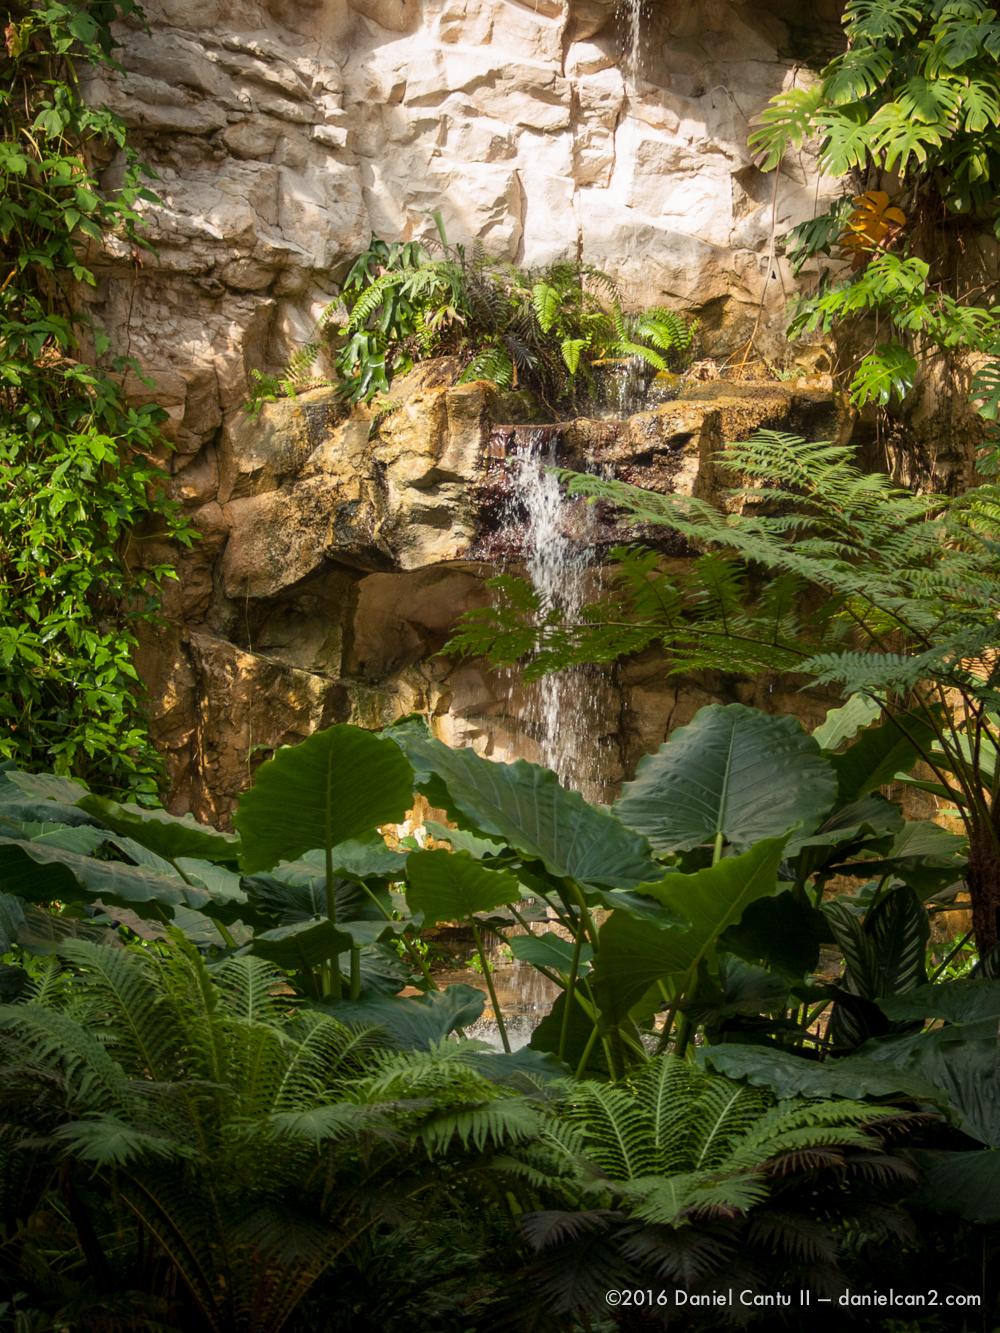 Daniel-Cantu-II-Botanical-Gardens-Oct-2016-52.jpg